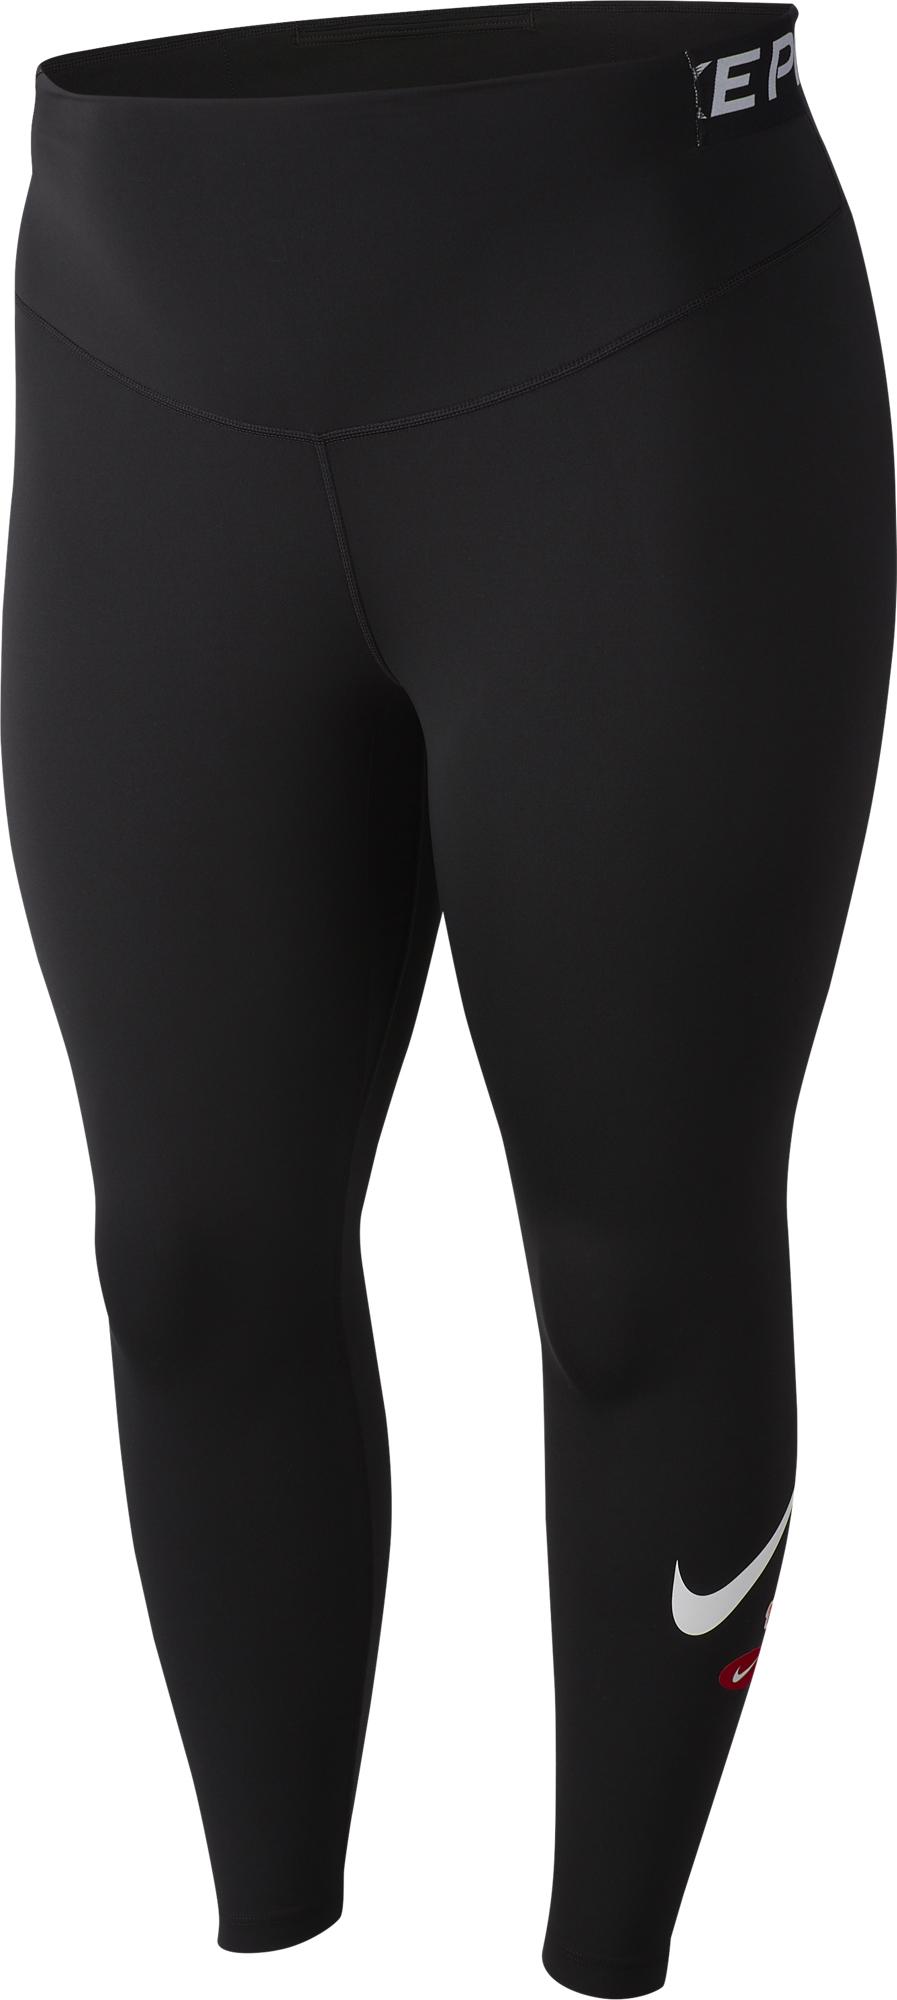 цена на Nike Легинсы женские Nike One, Plus Size, размер 52-54